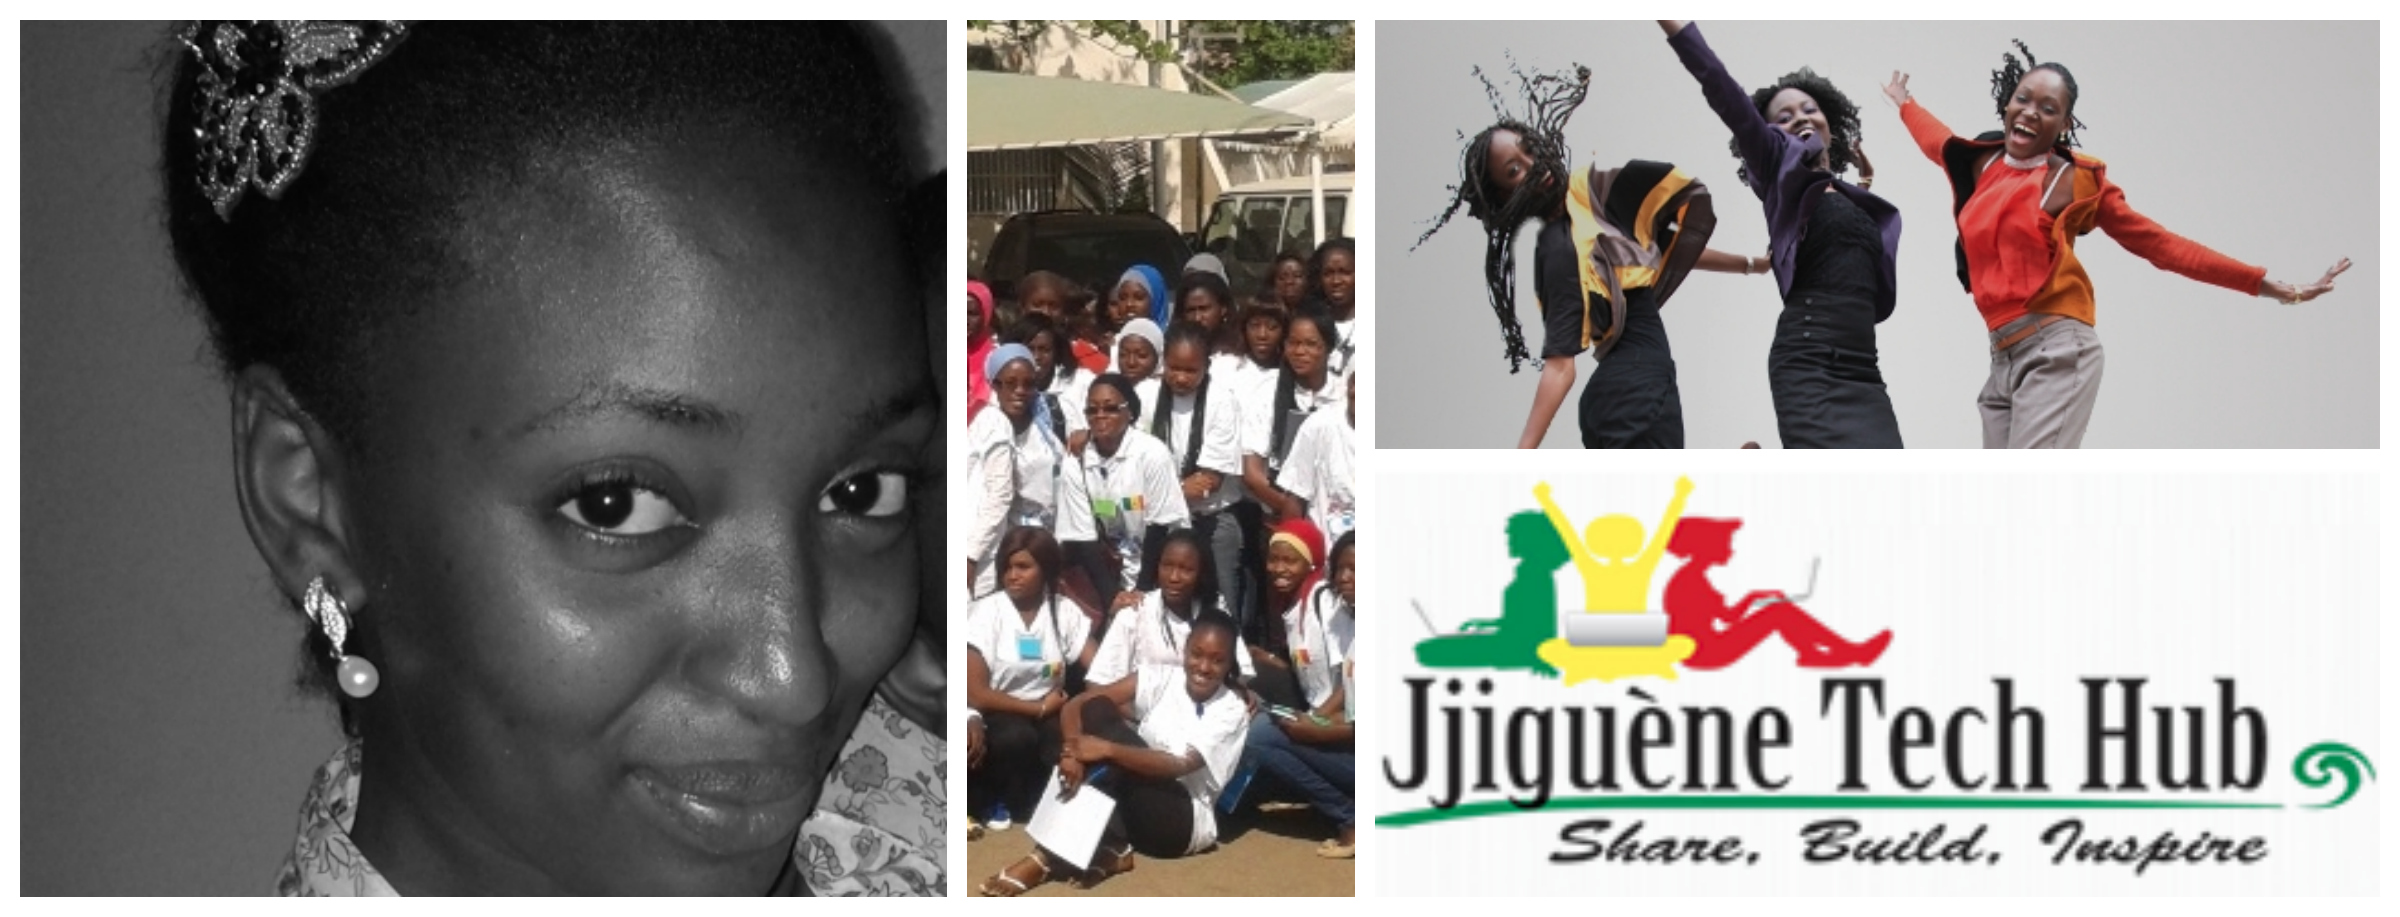 Binta Coudy Dé ,  vice president & co-founder of Jjiguene Tech Hub